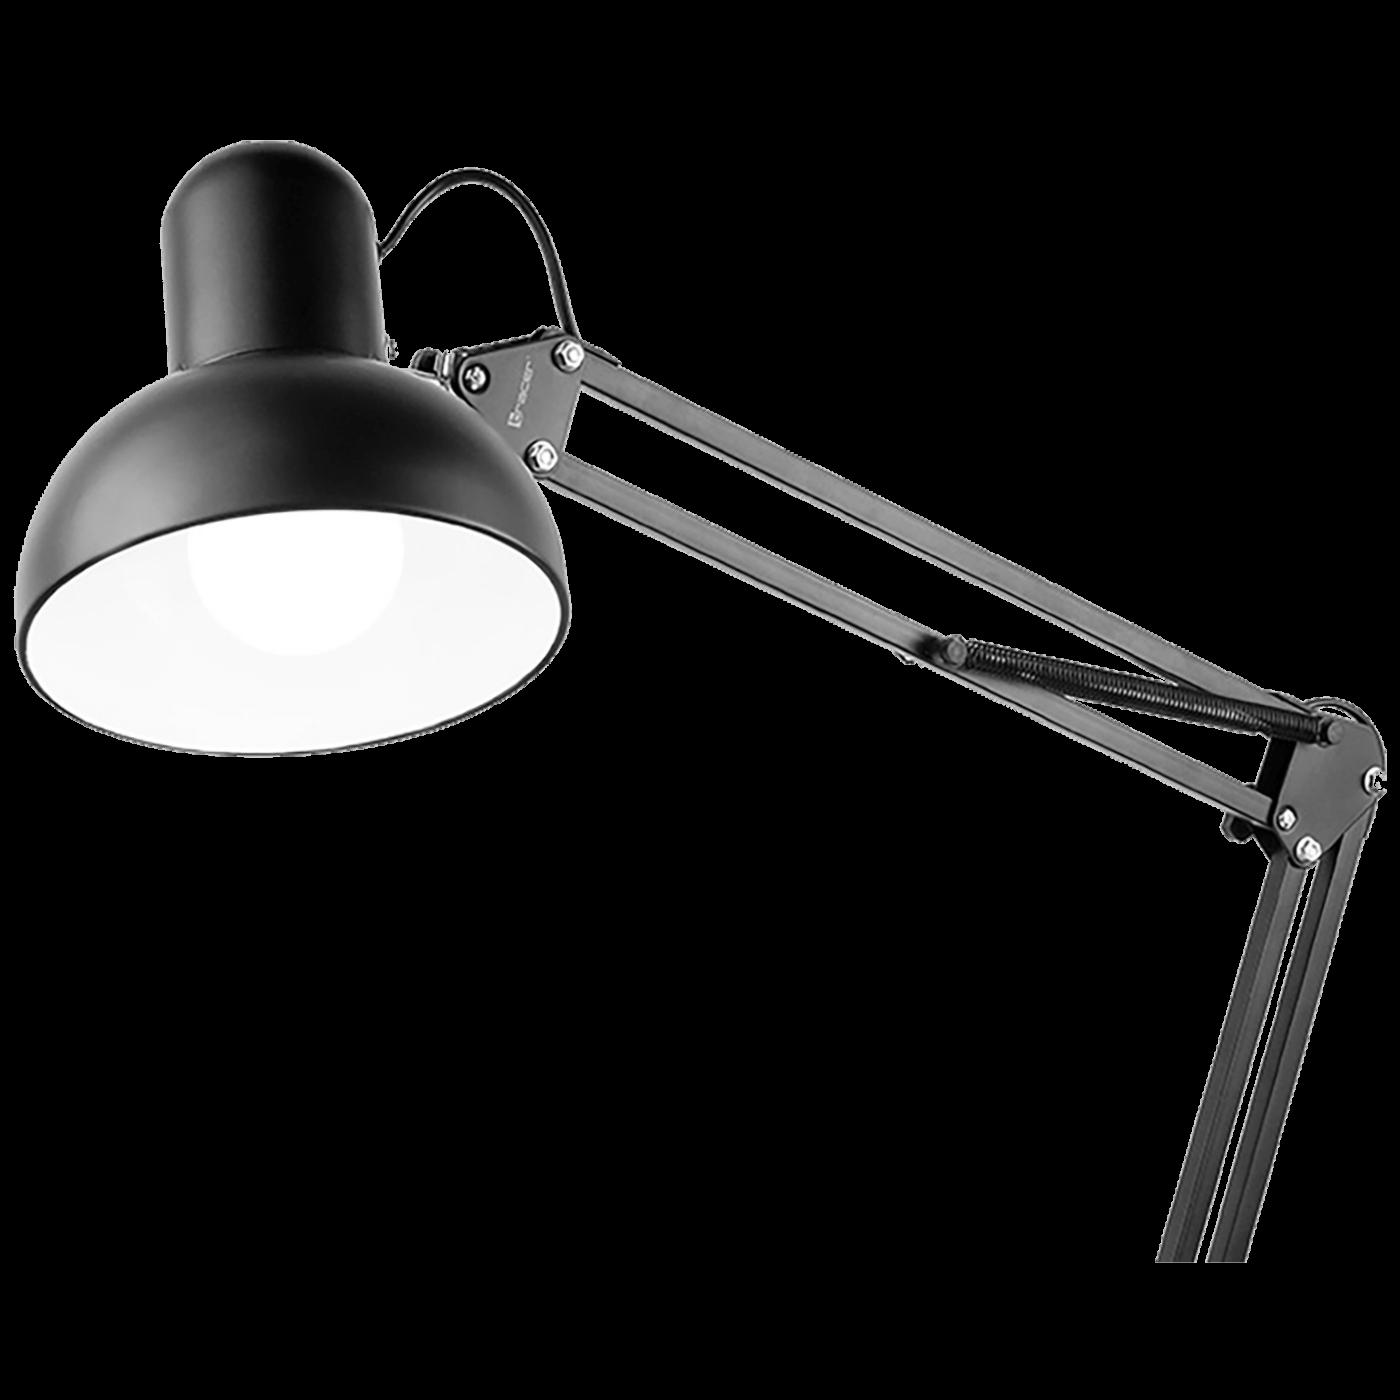 CLIP CLAMP DESK LAMP ARTISTA